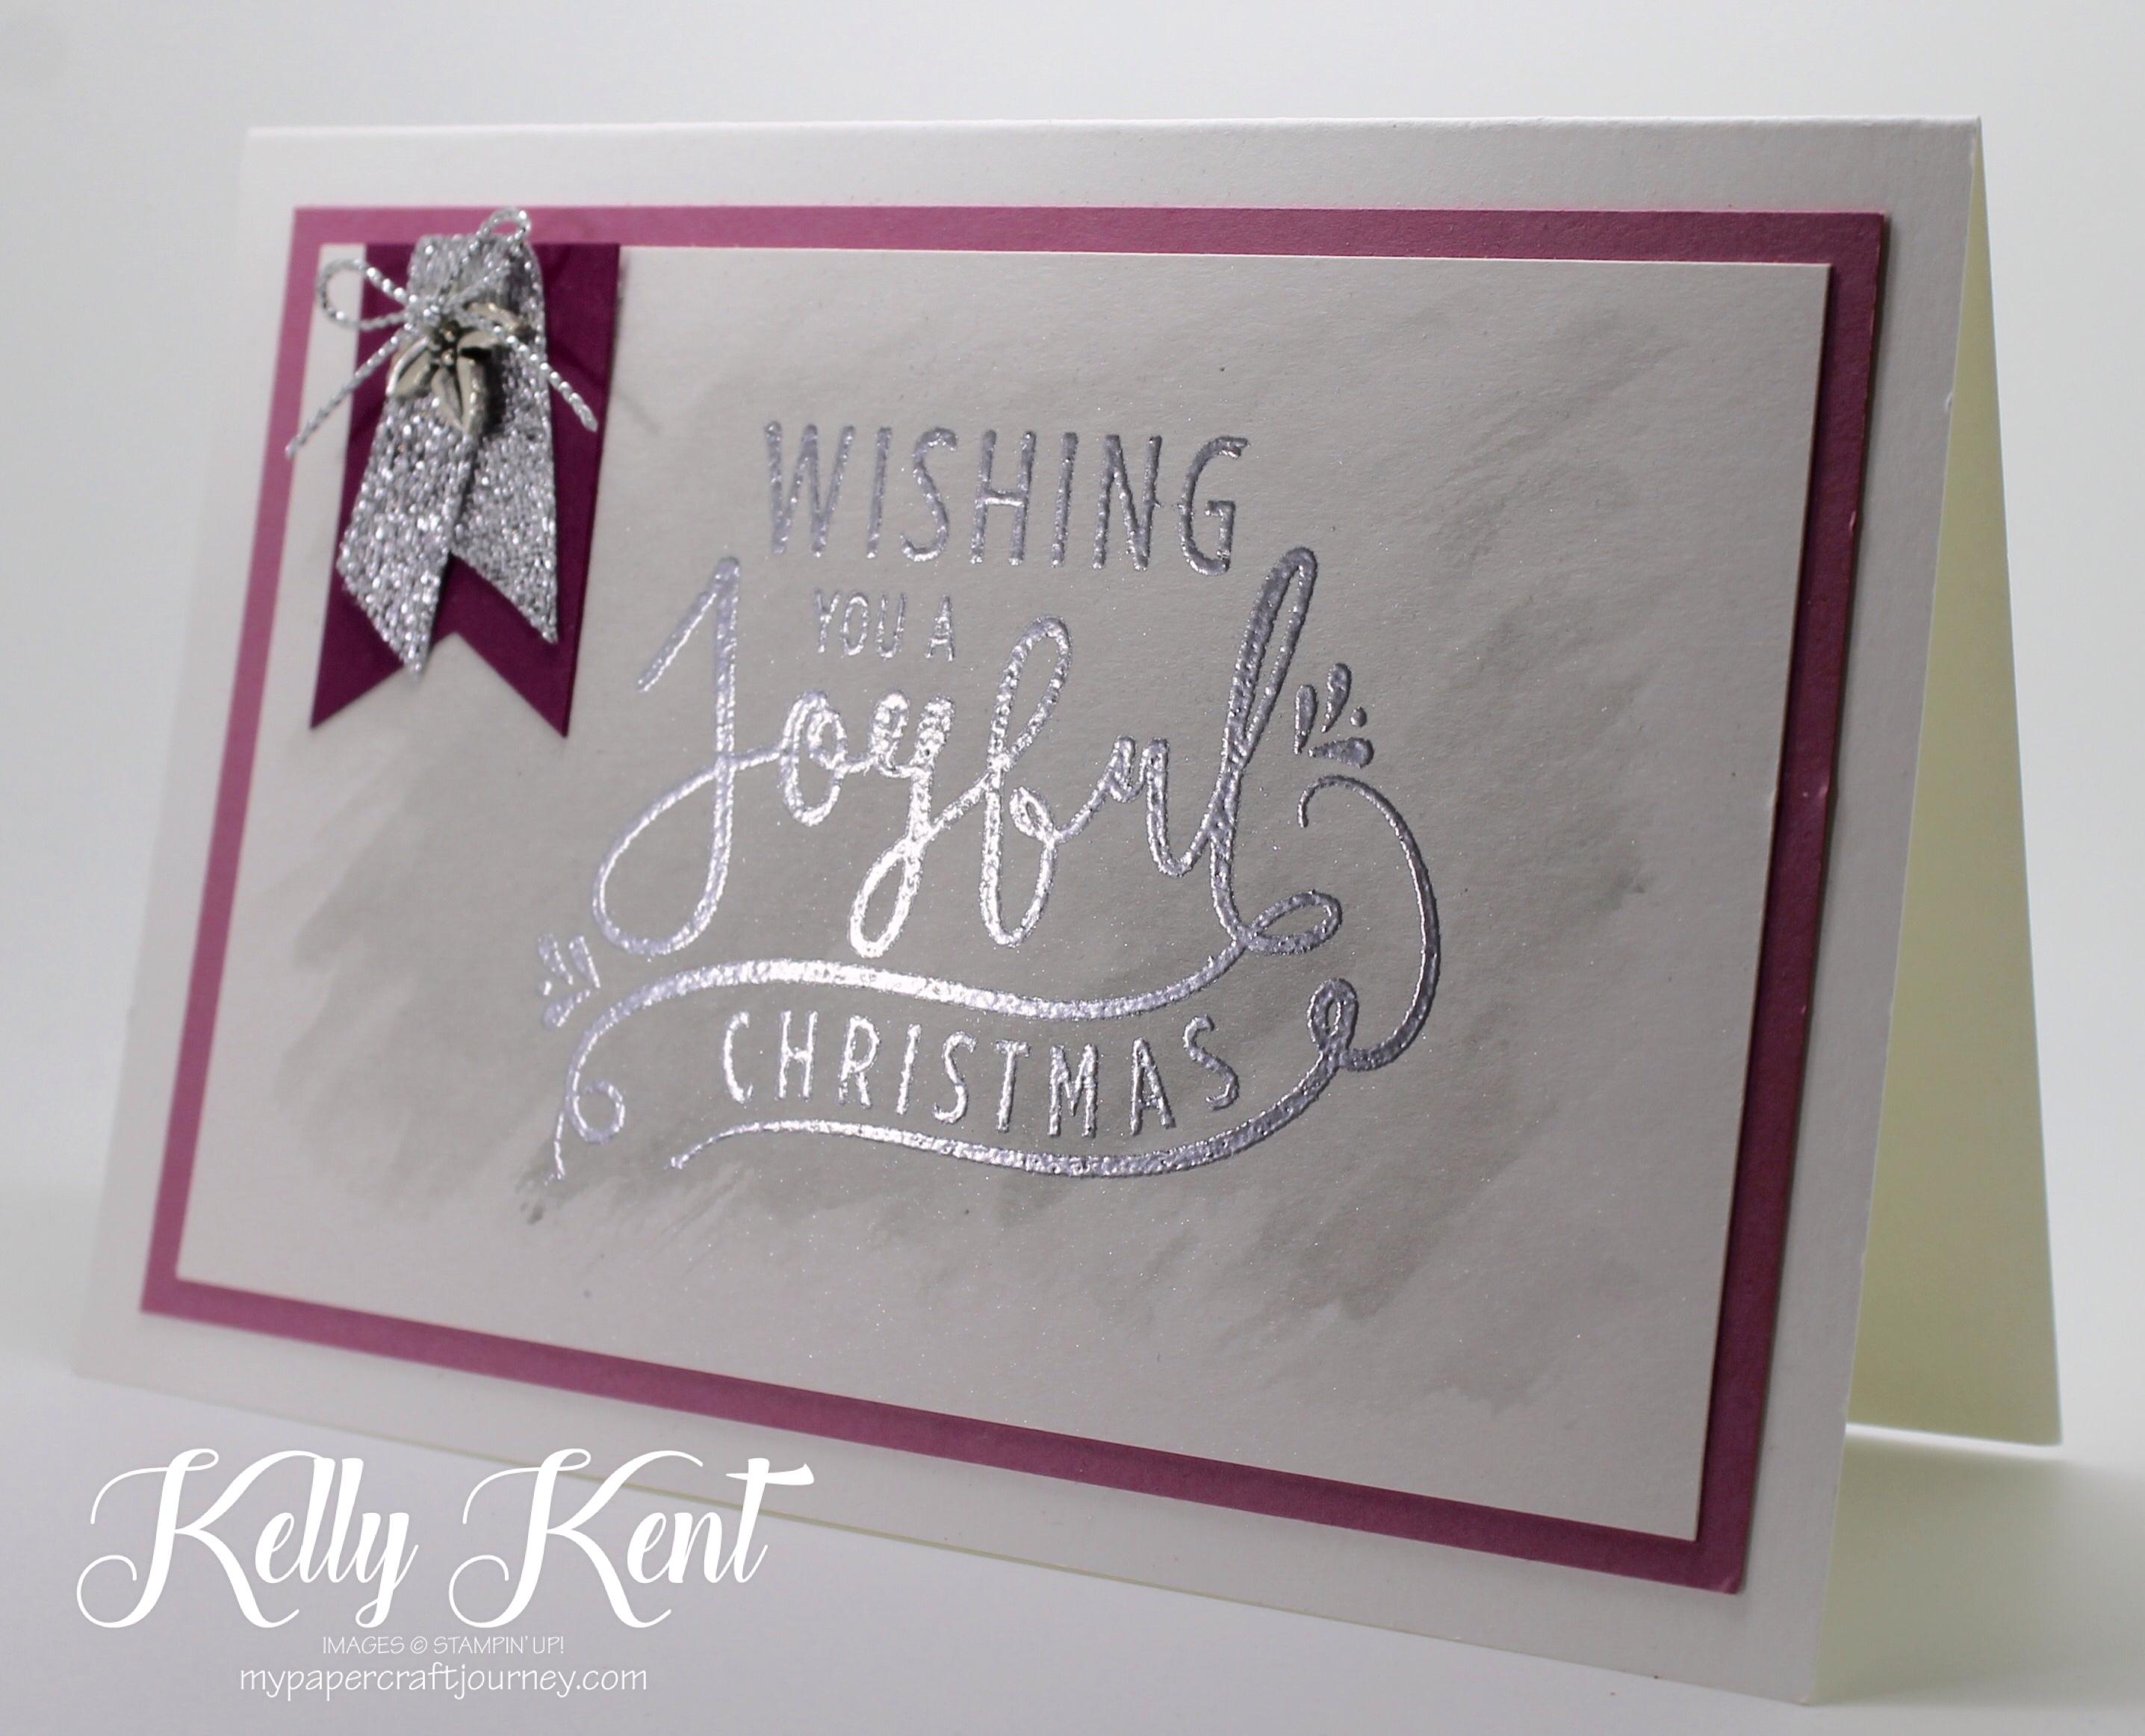 Wonderful Year Christmas card. Kelly Kent - mypapercraftjourney.com.